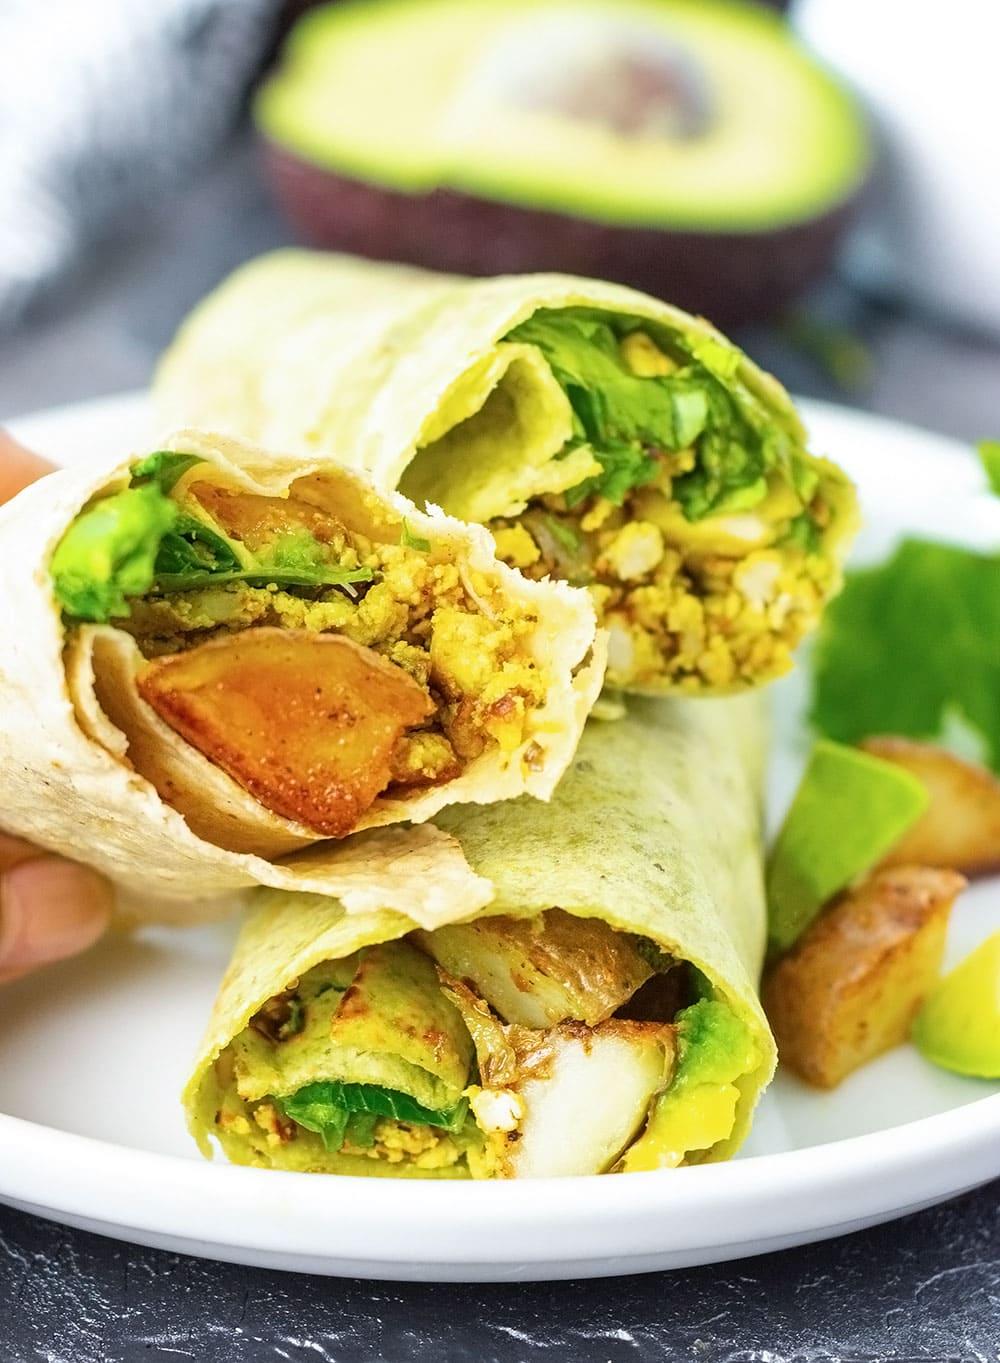 Vegan Breakfast Burrito on a white plate